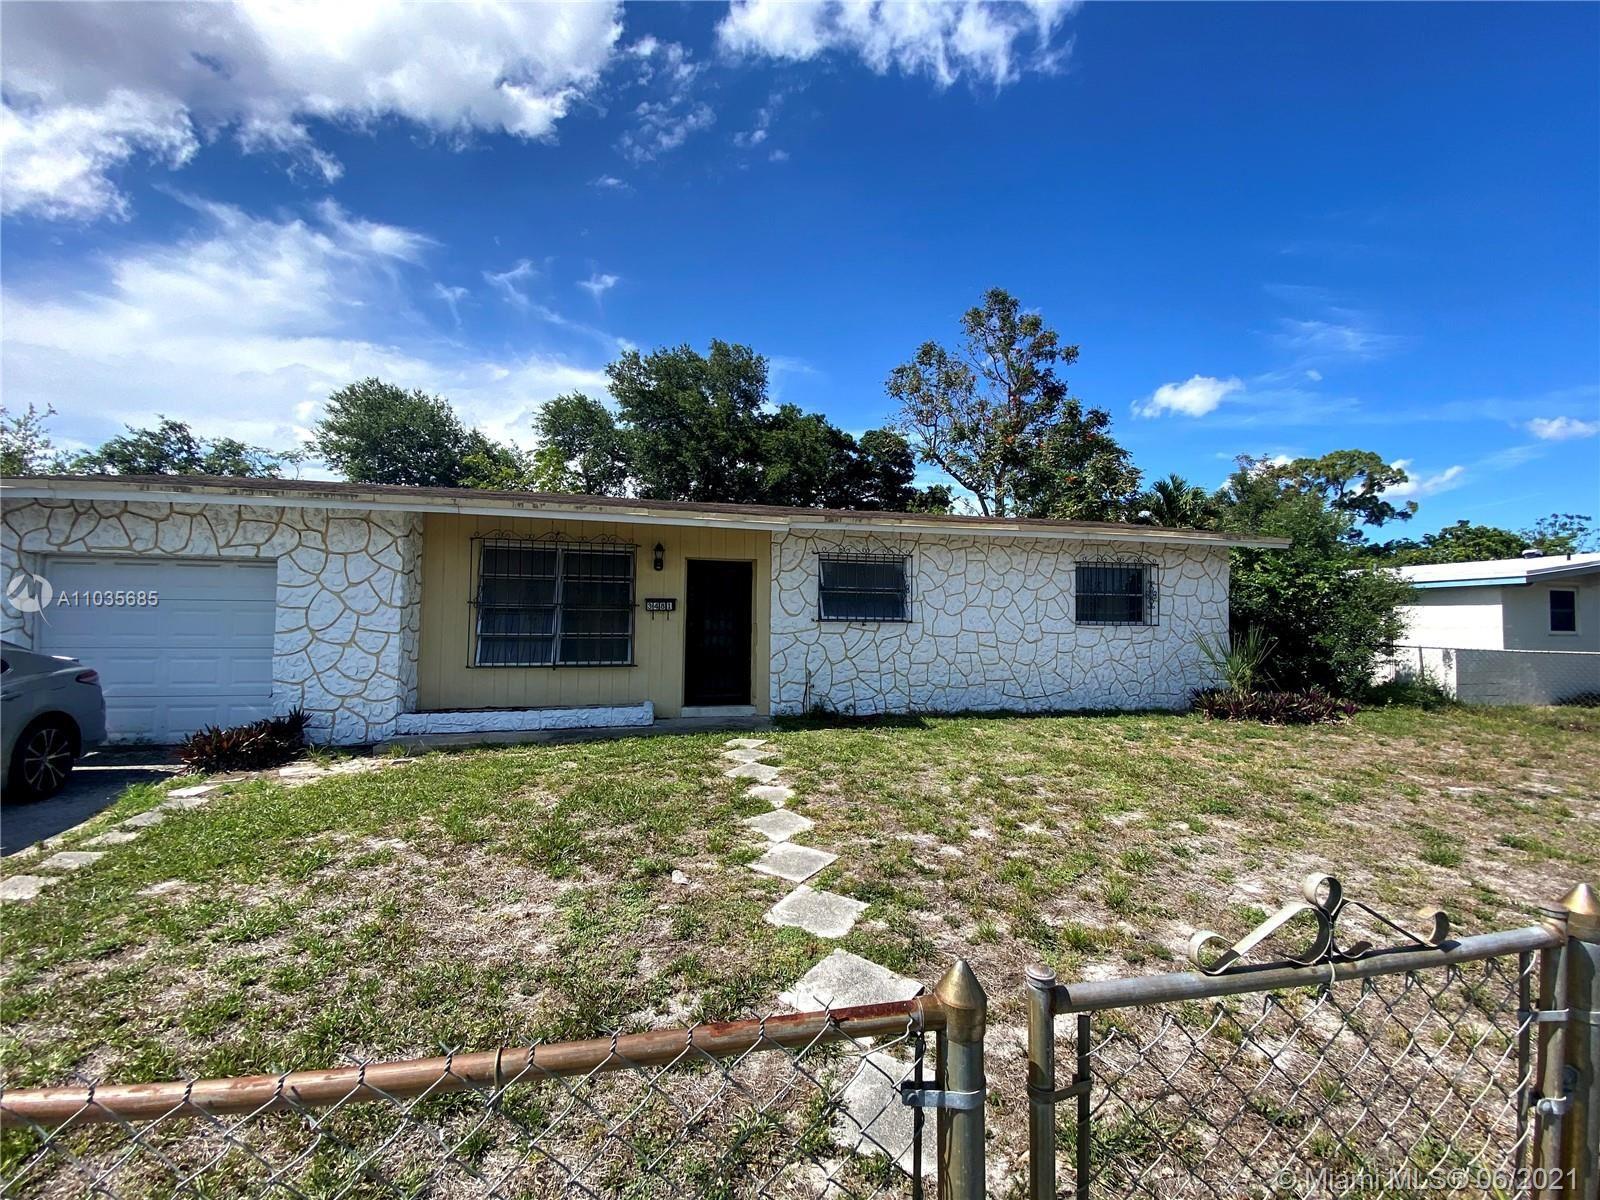 3481 NW 211th St, Miami Gardens, FL 33056 - #: A11035685